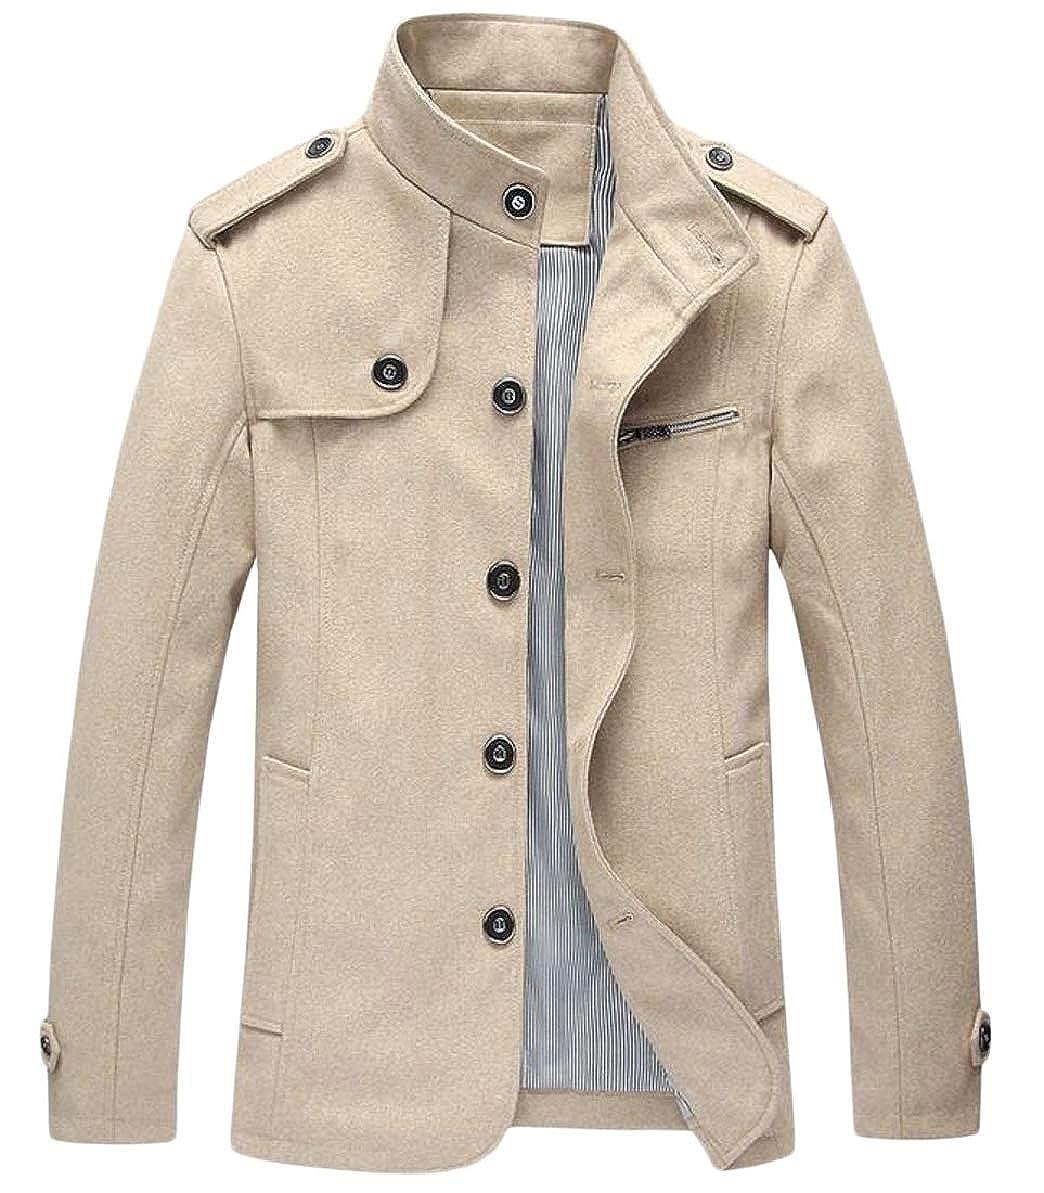 Khaki Xswsy XG-CA Men's Winter Trench Coat Wool Blend Single Breasted Overcoat